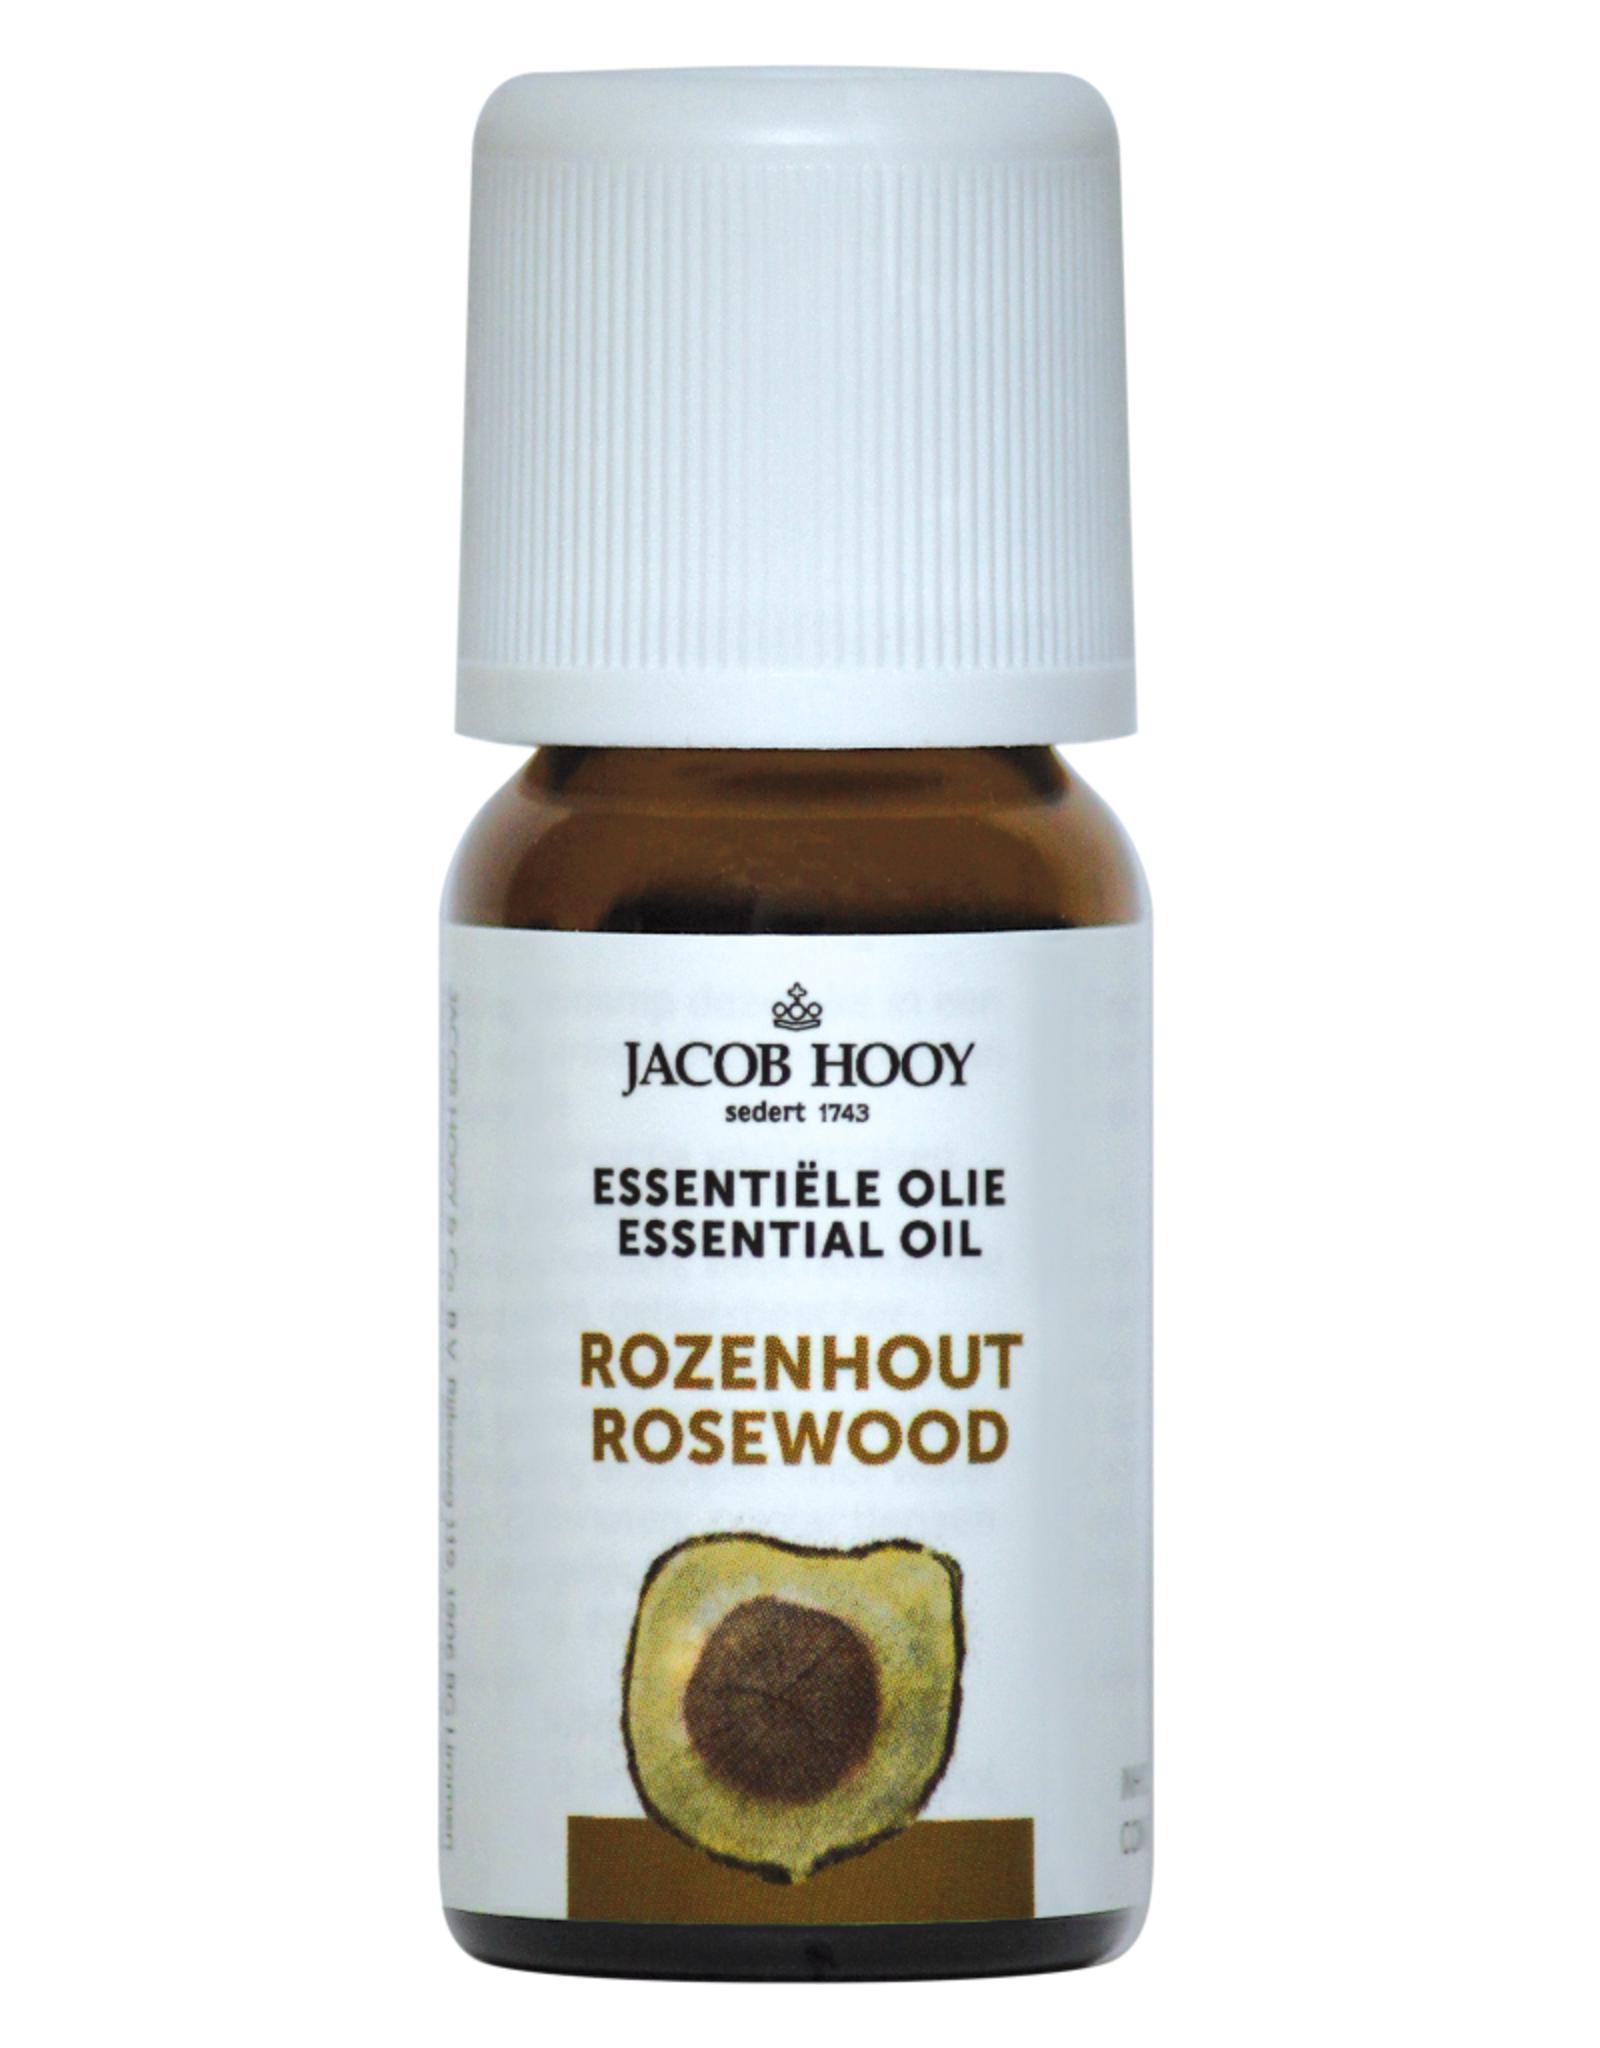 Rozenhout essentiële olie Jacob Hooy 10ml